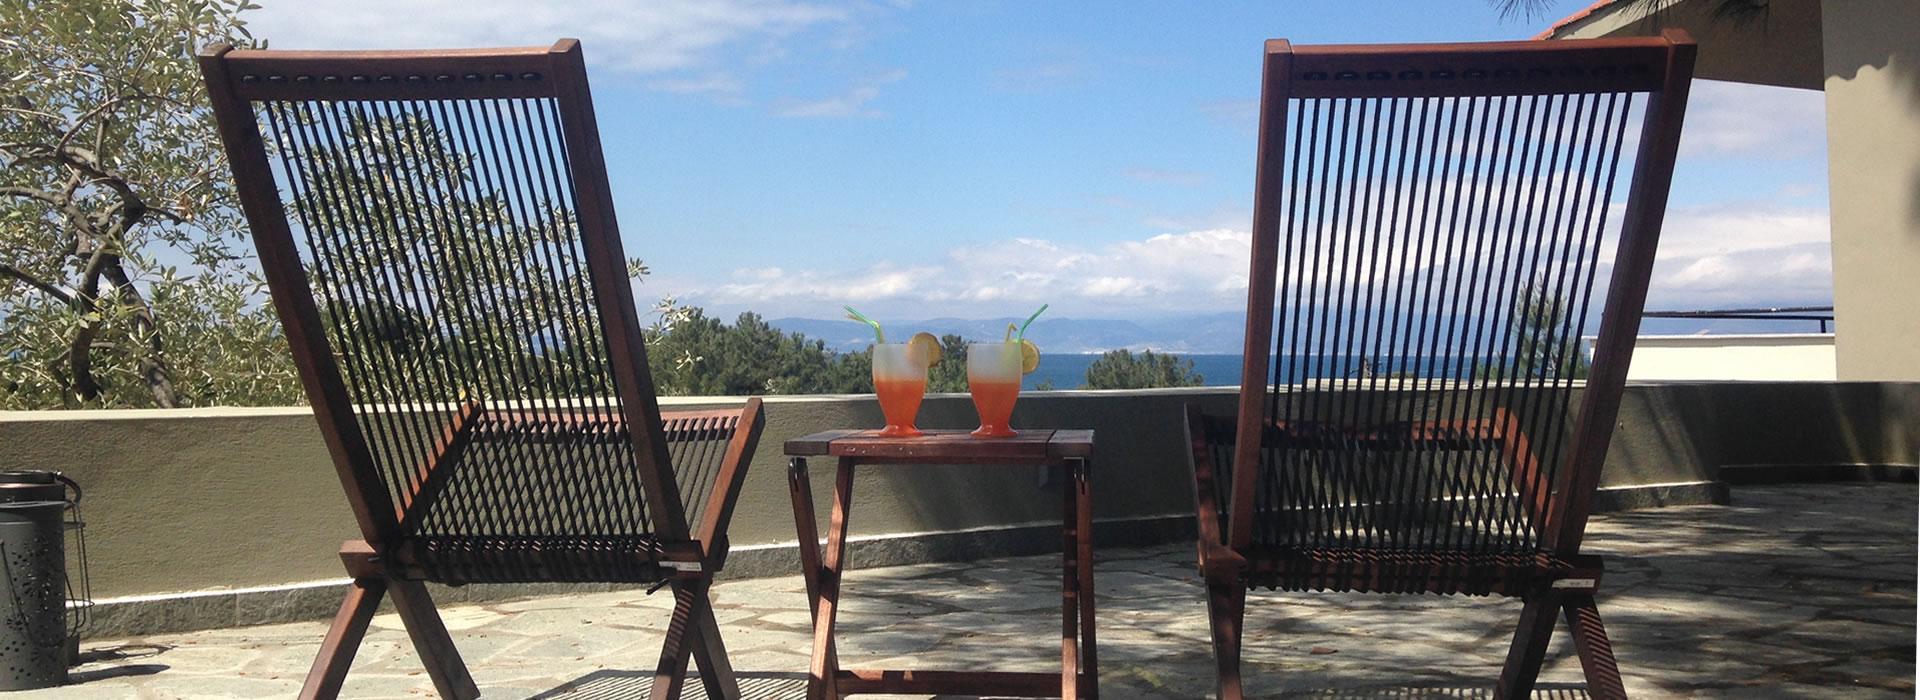 Armonia Villas Thassos - SeaView